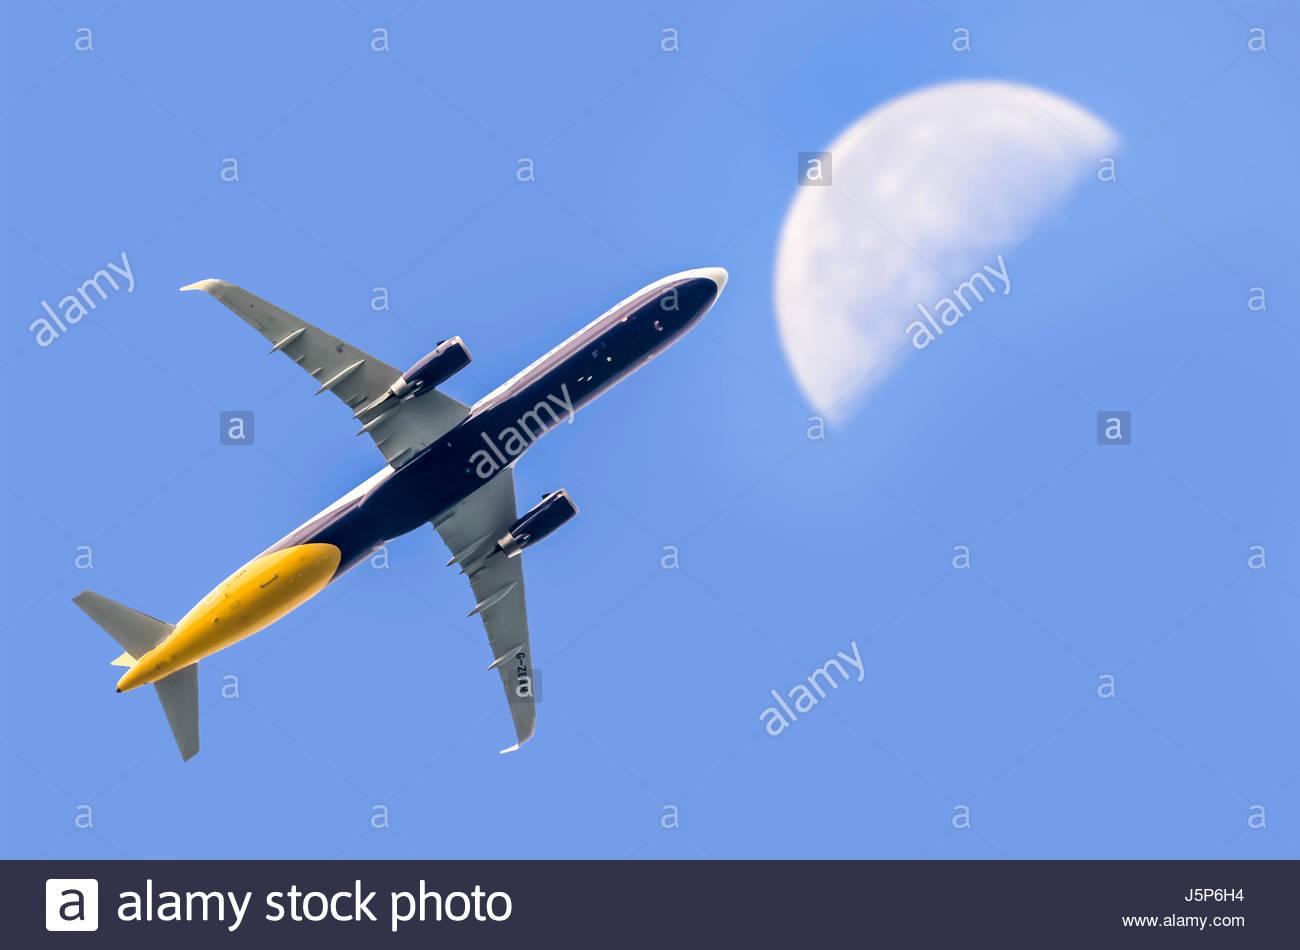 passenger-jet-plane-soaring-above-clouds